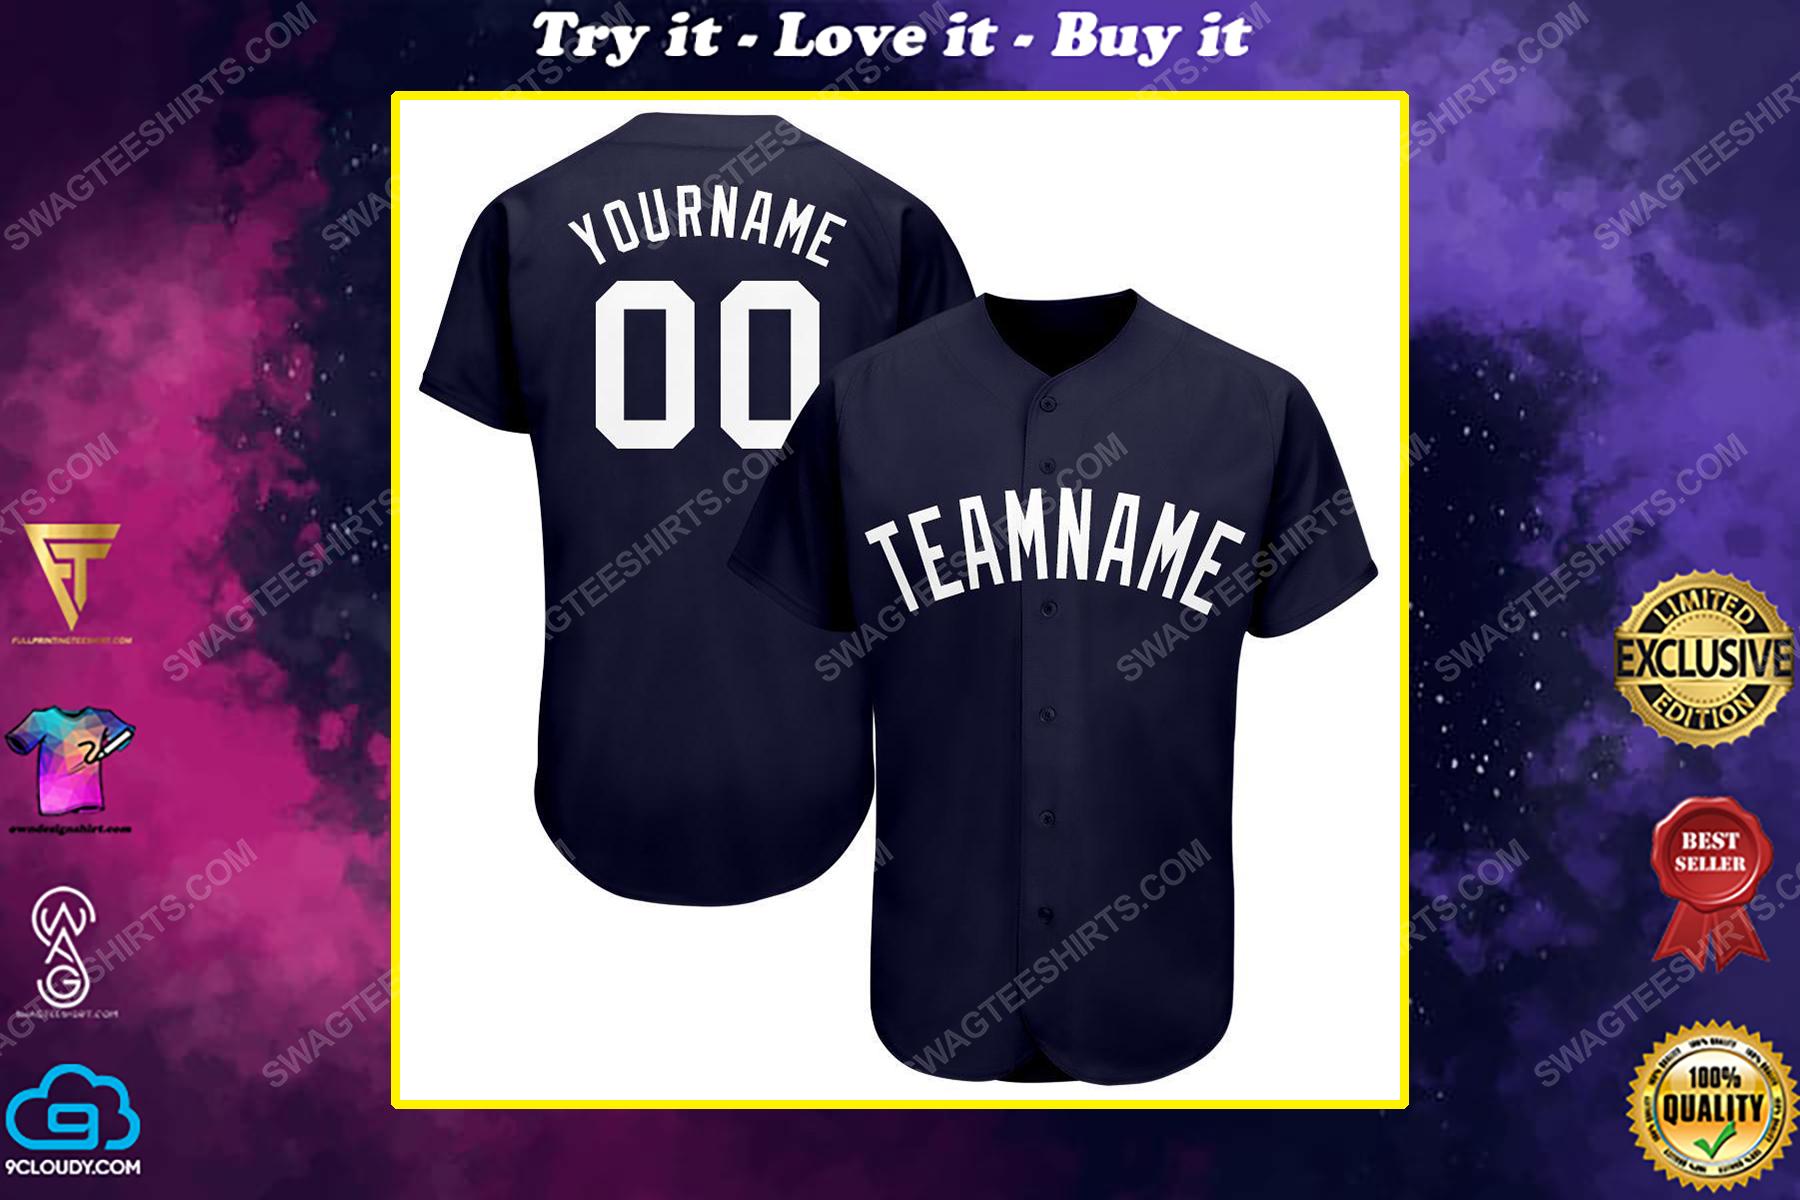 Custom team name new york yankees full printed baseball jersey